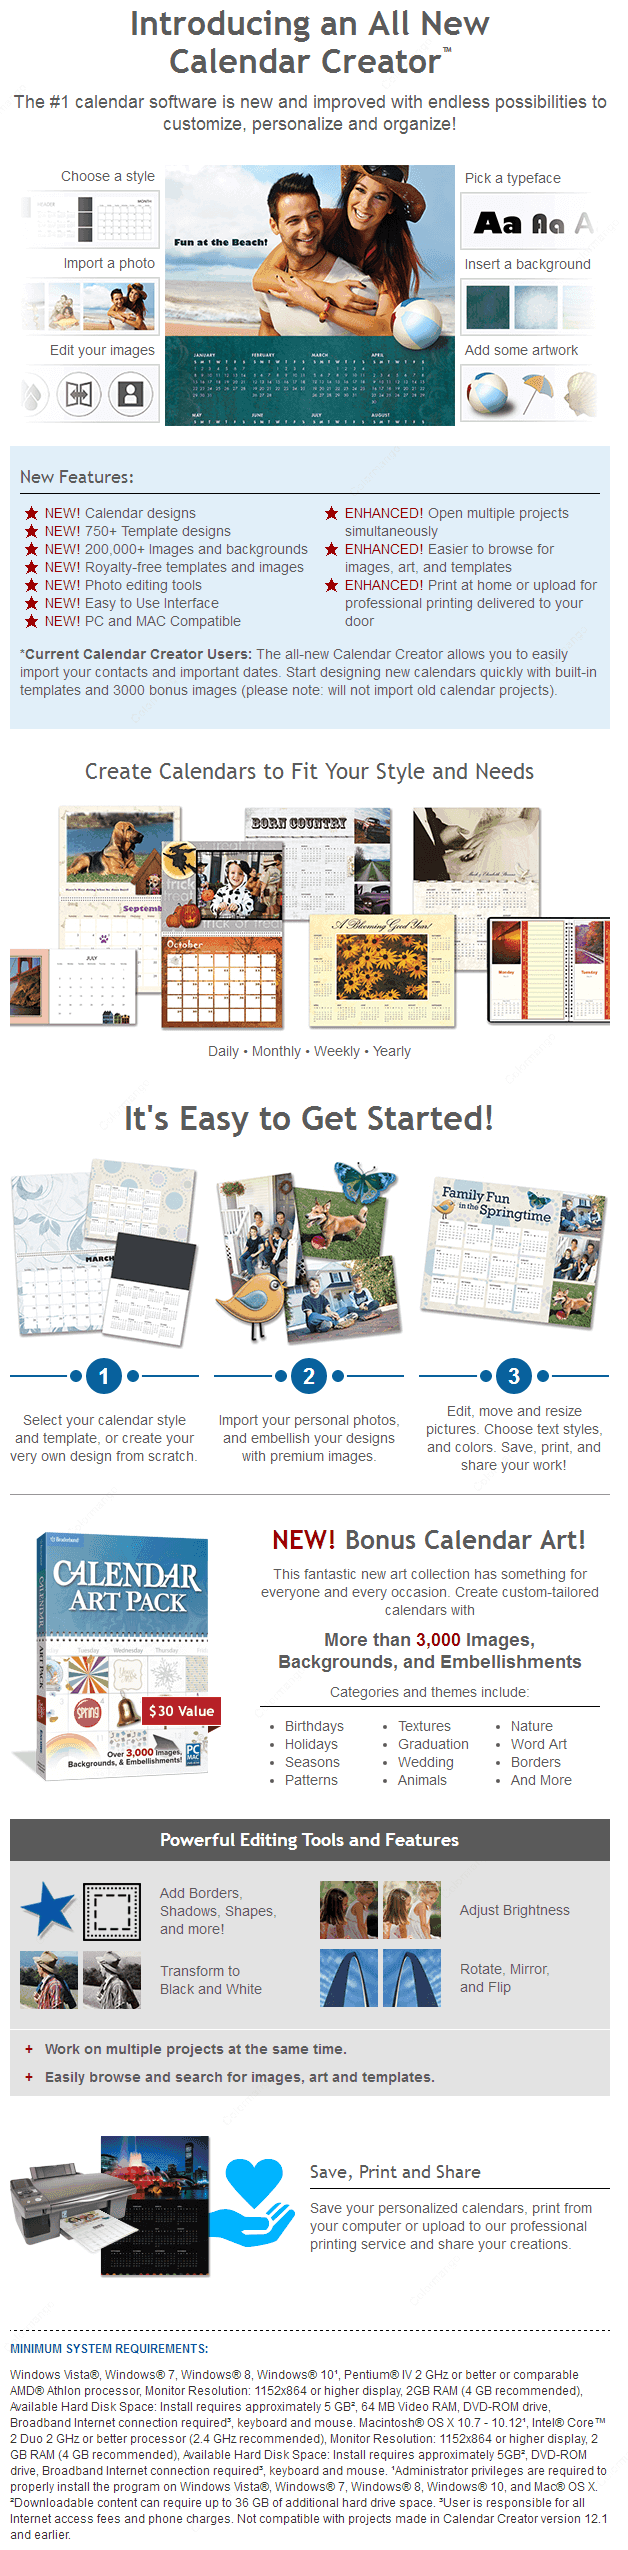 Calendar Creator Online Shopping, Price, Free Trial ...